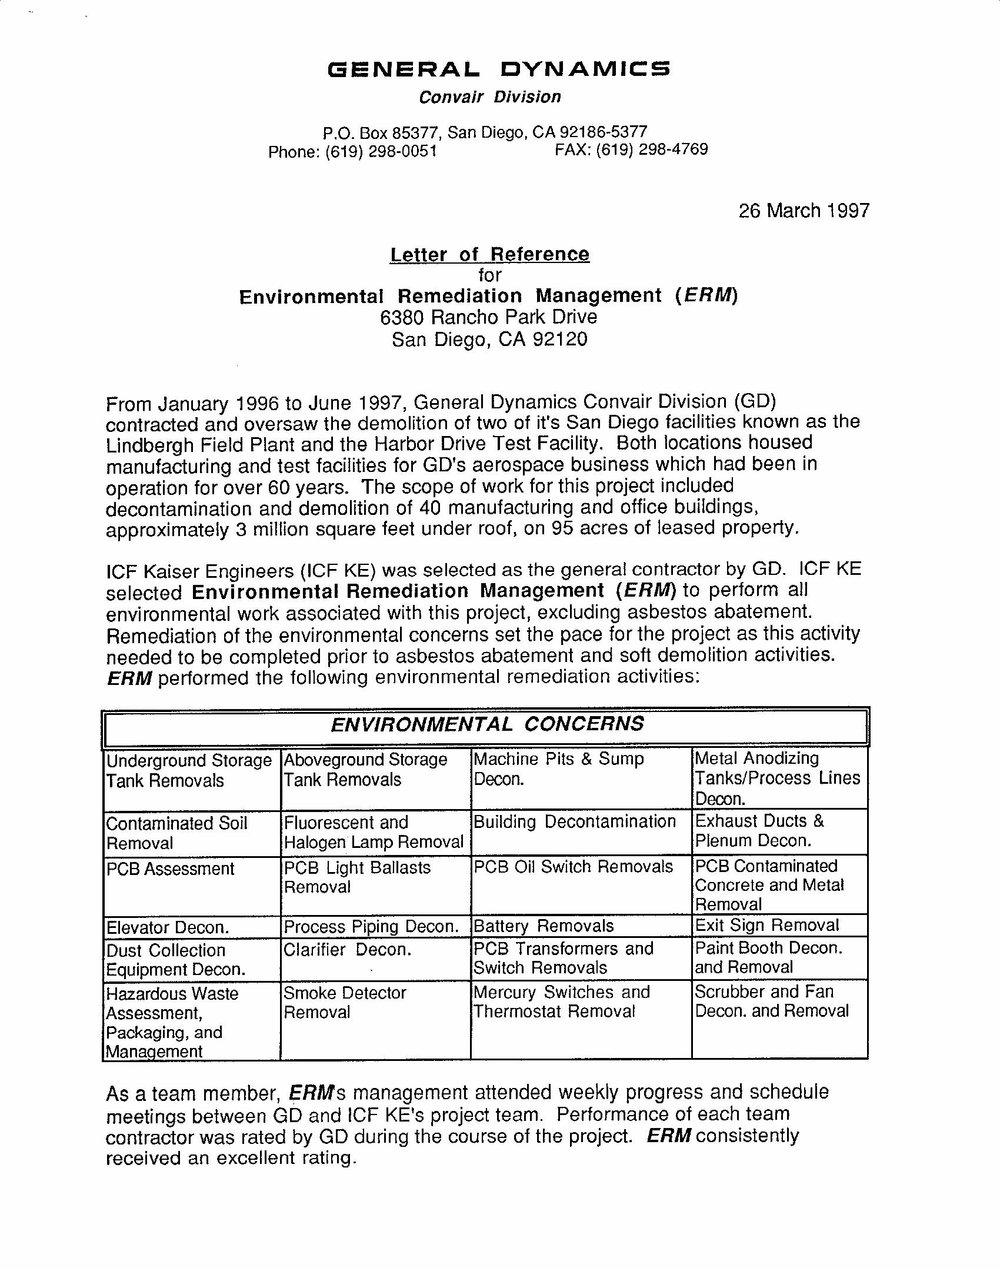 Reference Letter GD 003 (1).jpg